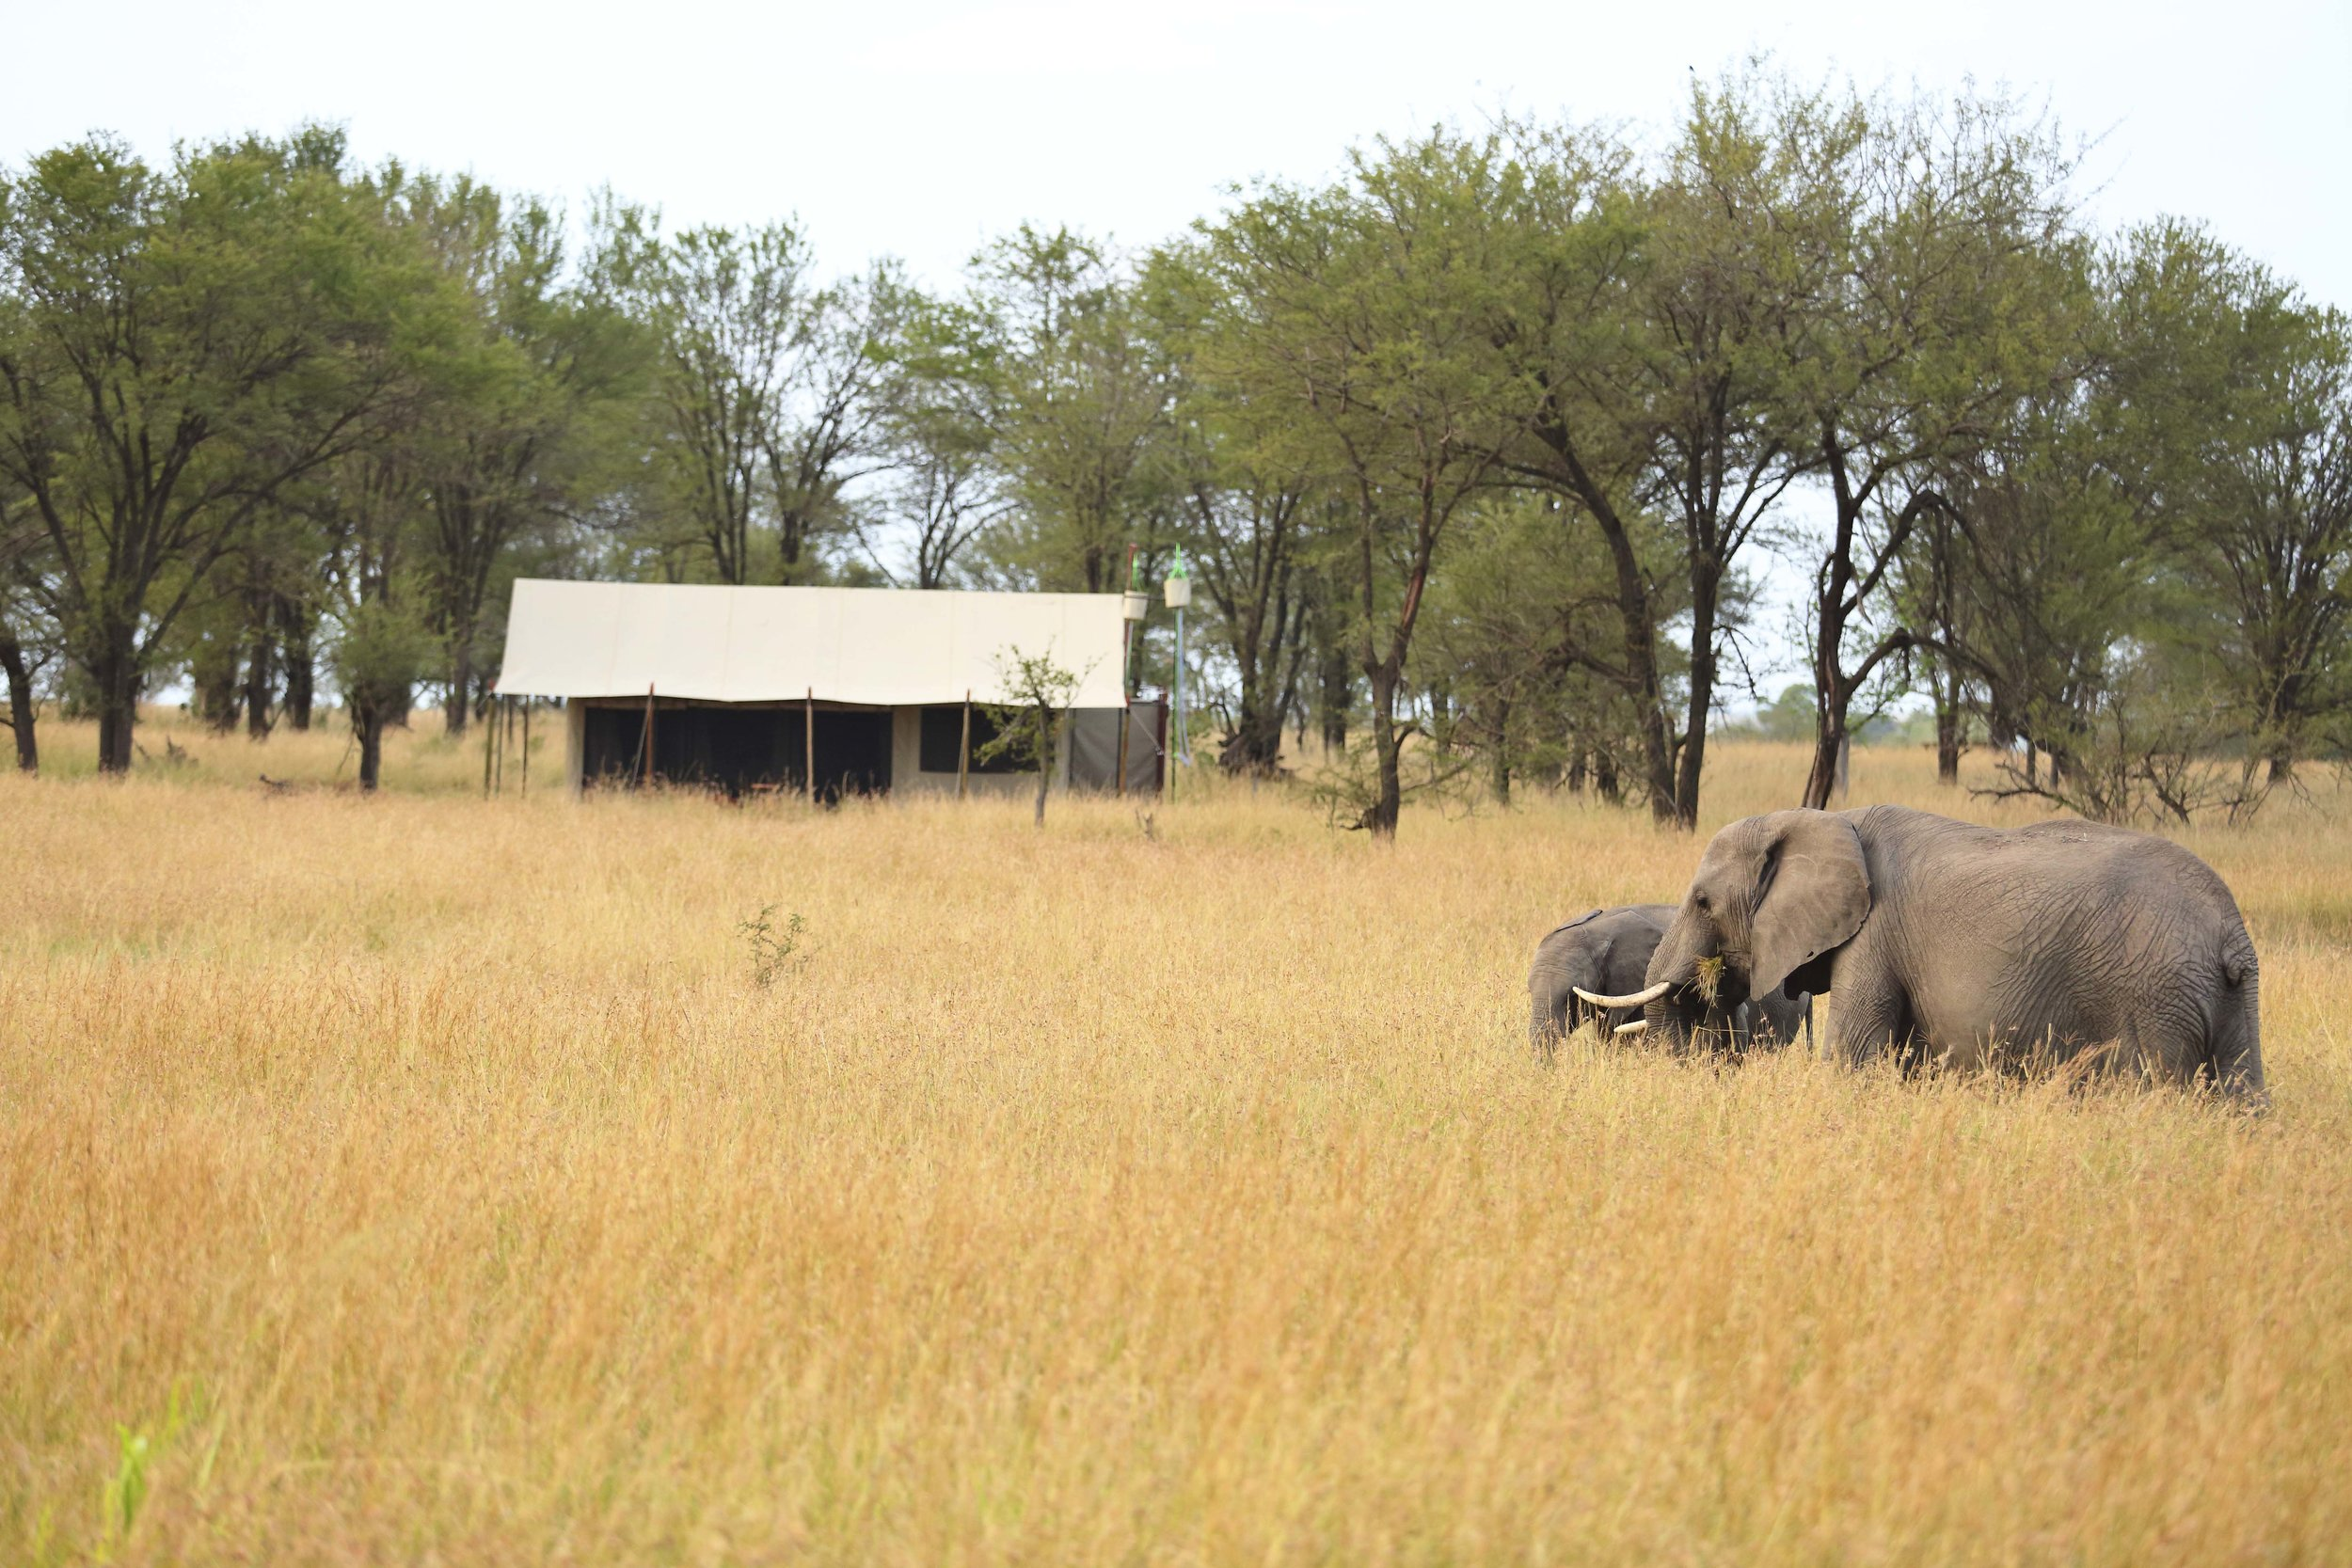 kimondo-camp-elephant-in-camp.jpg